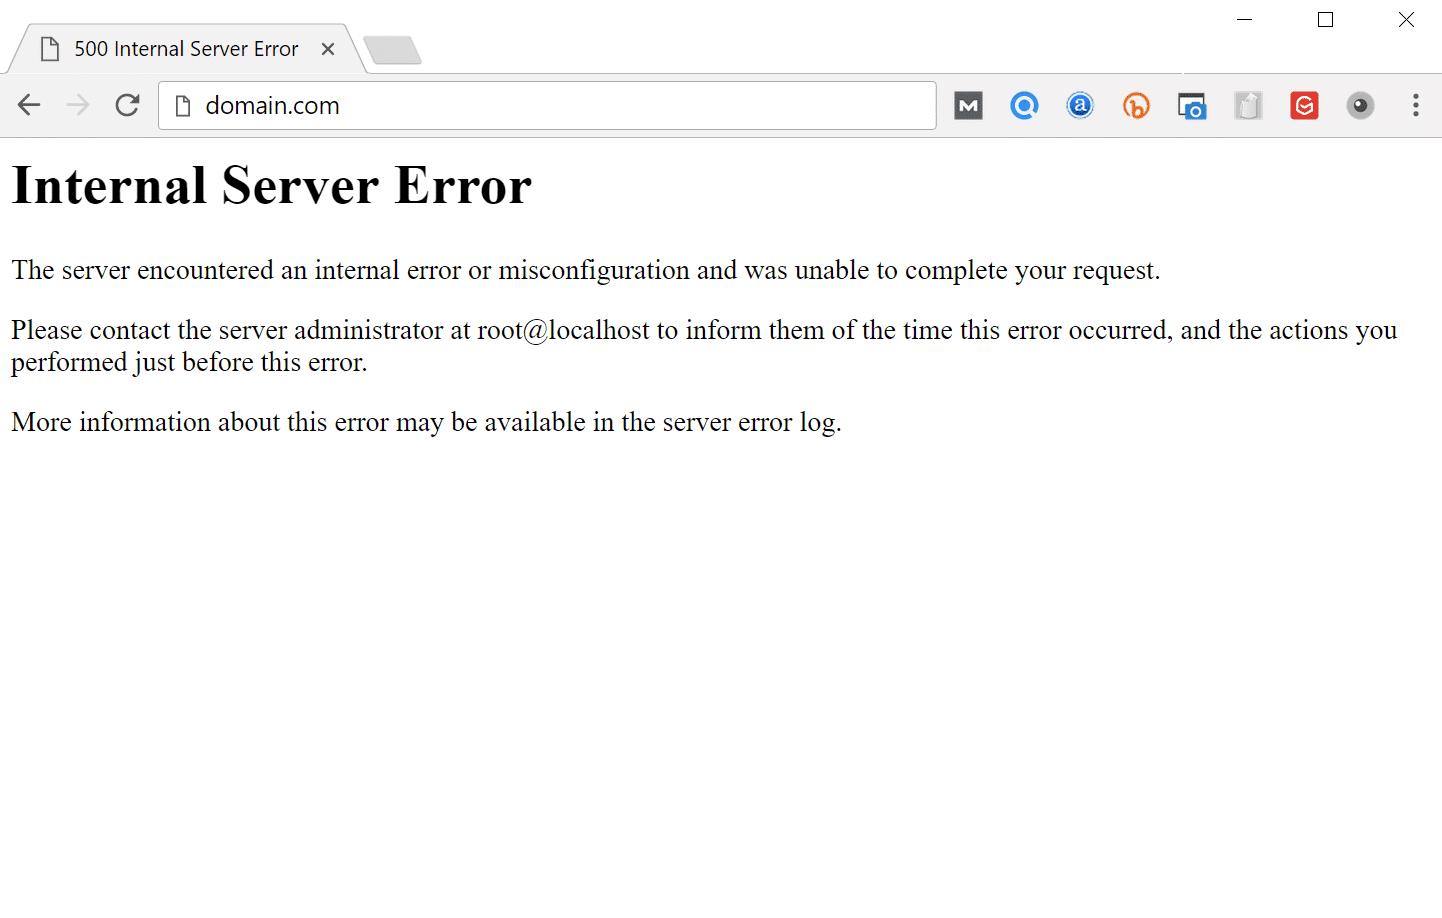 Erreur interne du serveur